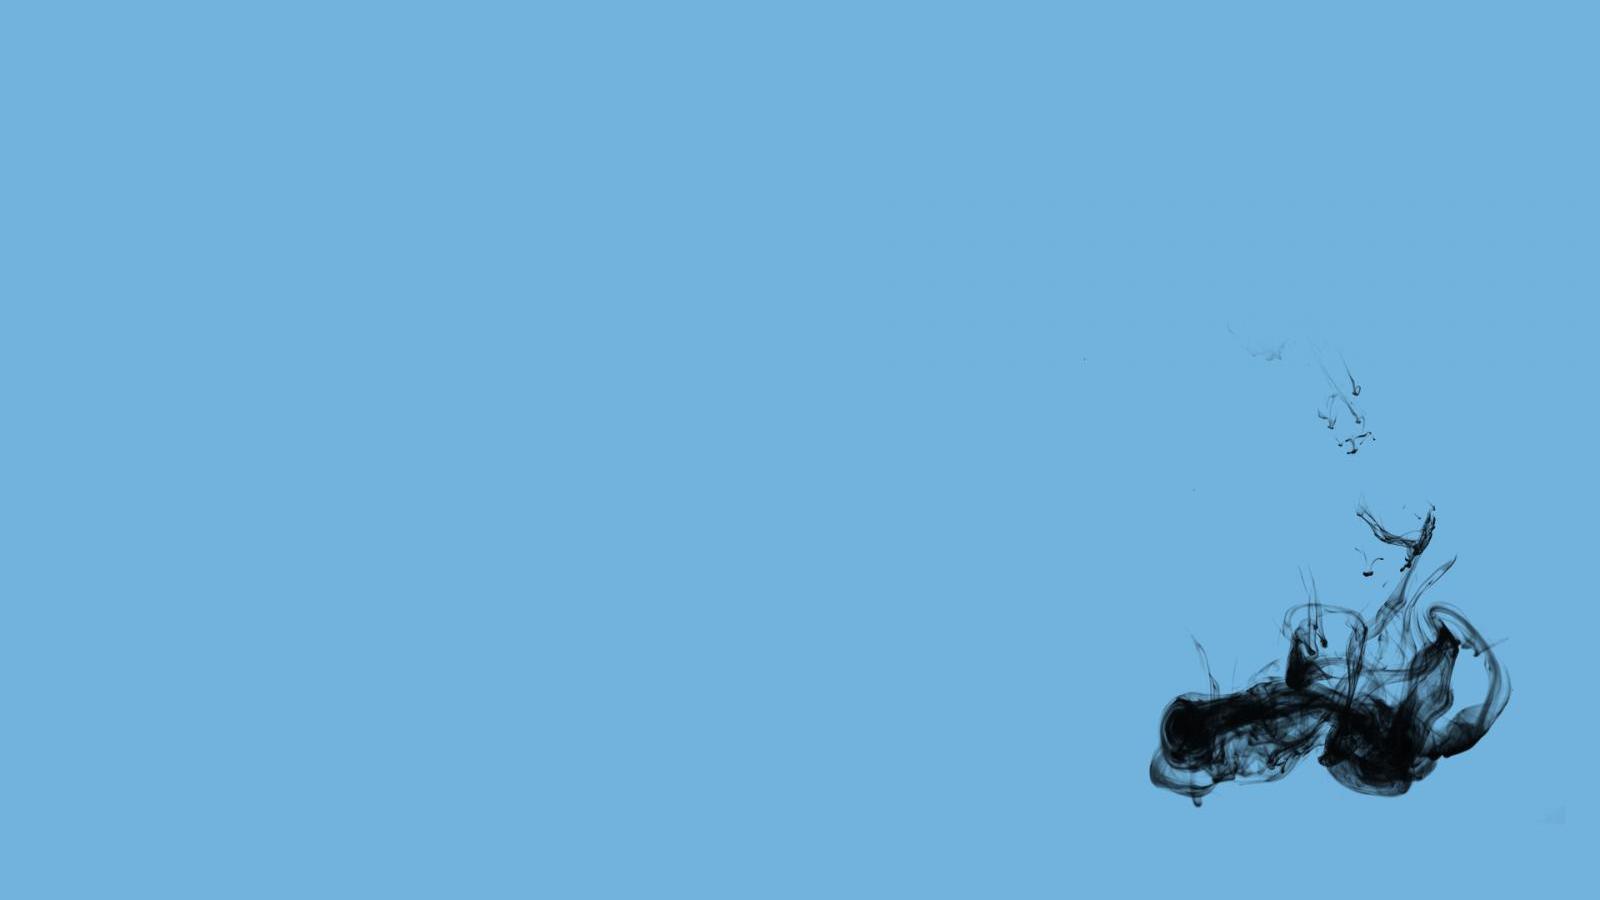 1600x900 Baby Blue Black Wallpaper Blue Wallpapers 1600x900